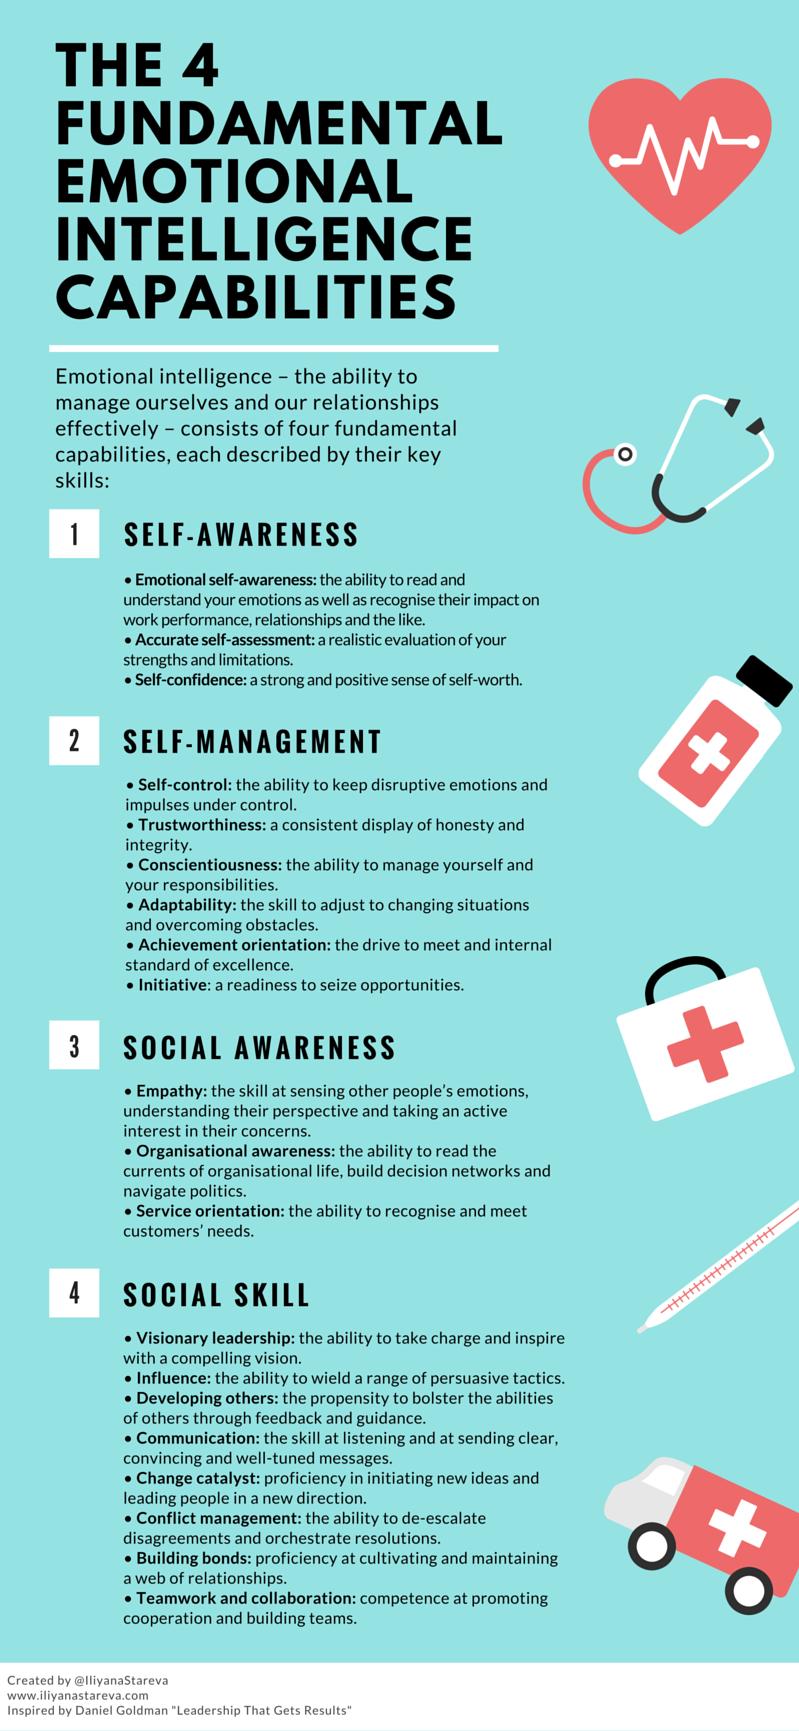 the 4 key emotional intelligence capabilities [infographic]